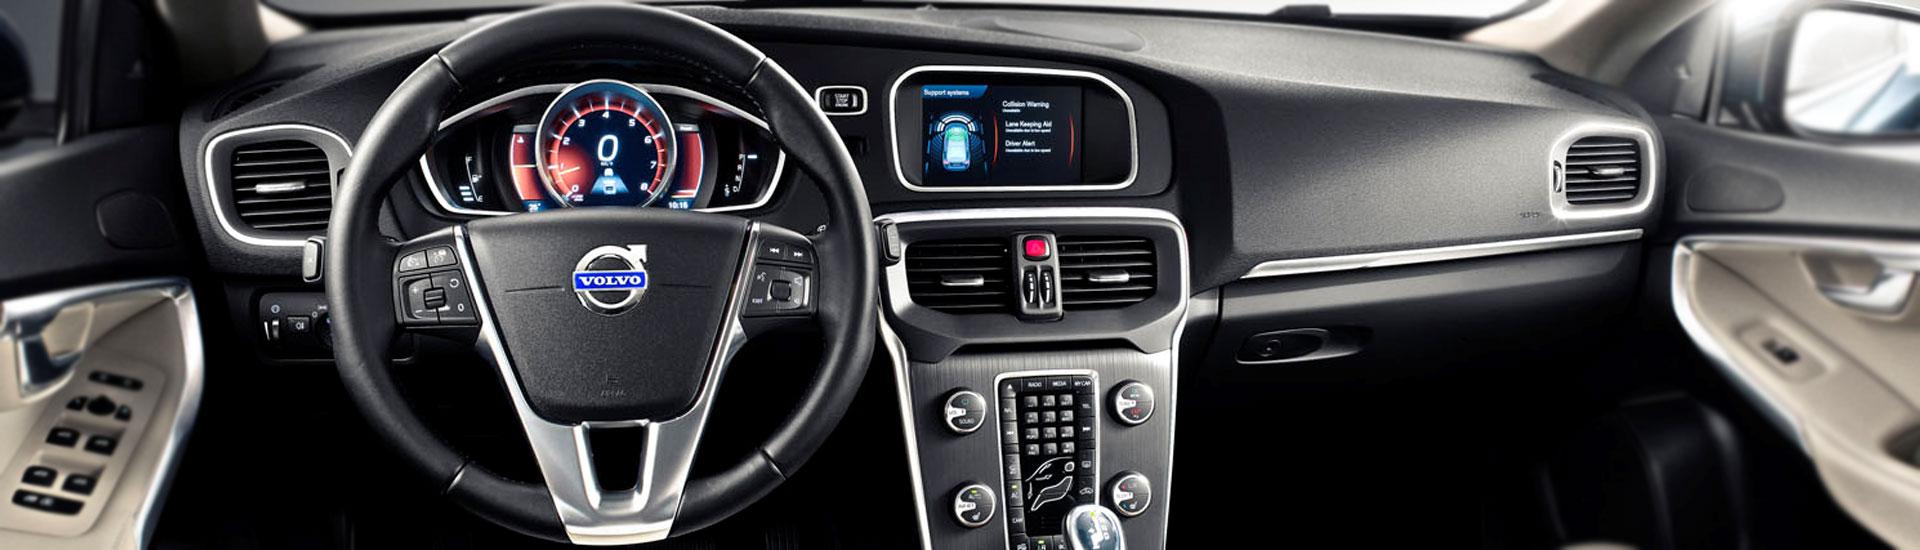 Volvo C30 Dash Kits | Custom Volvo C30 Dash Kit